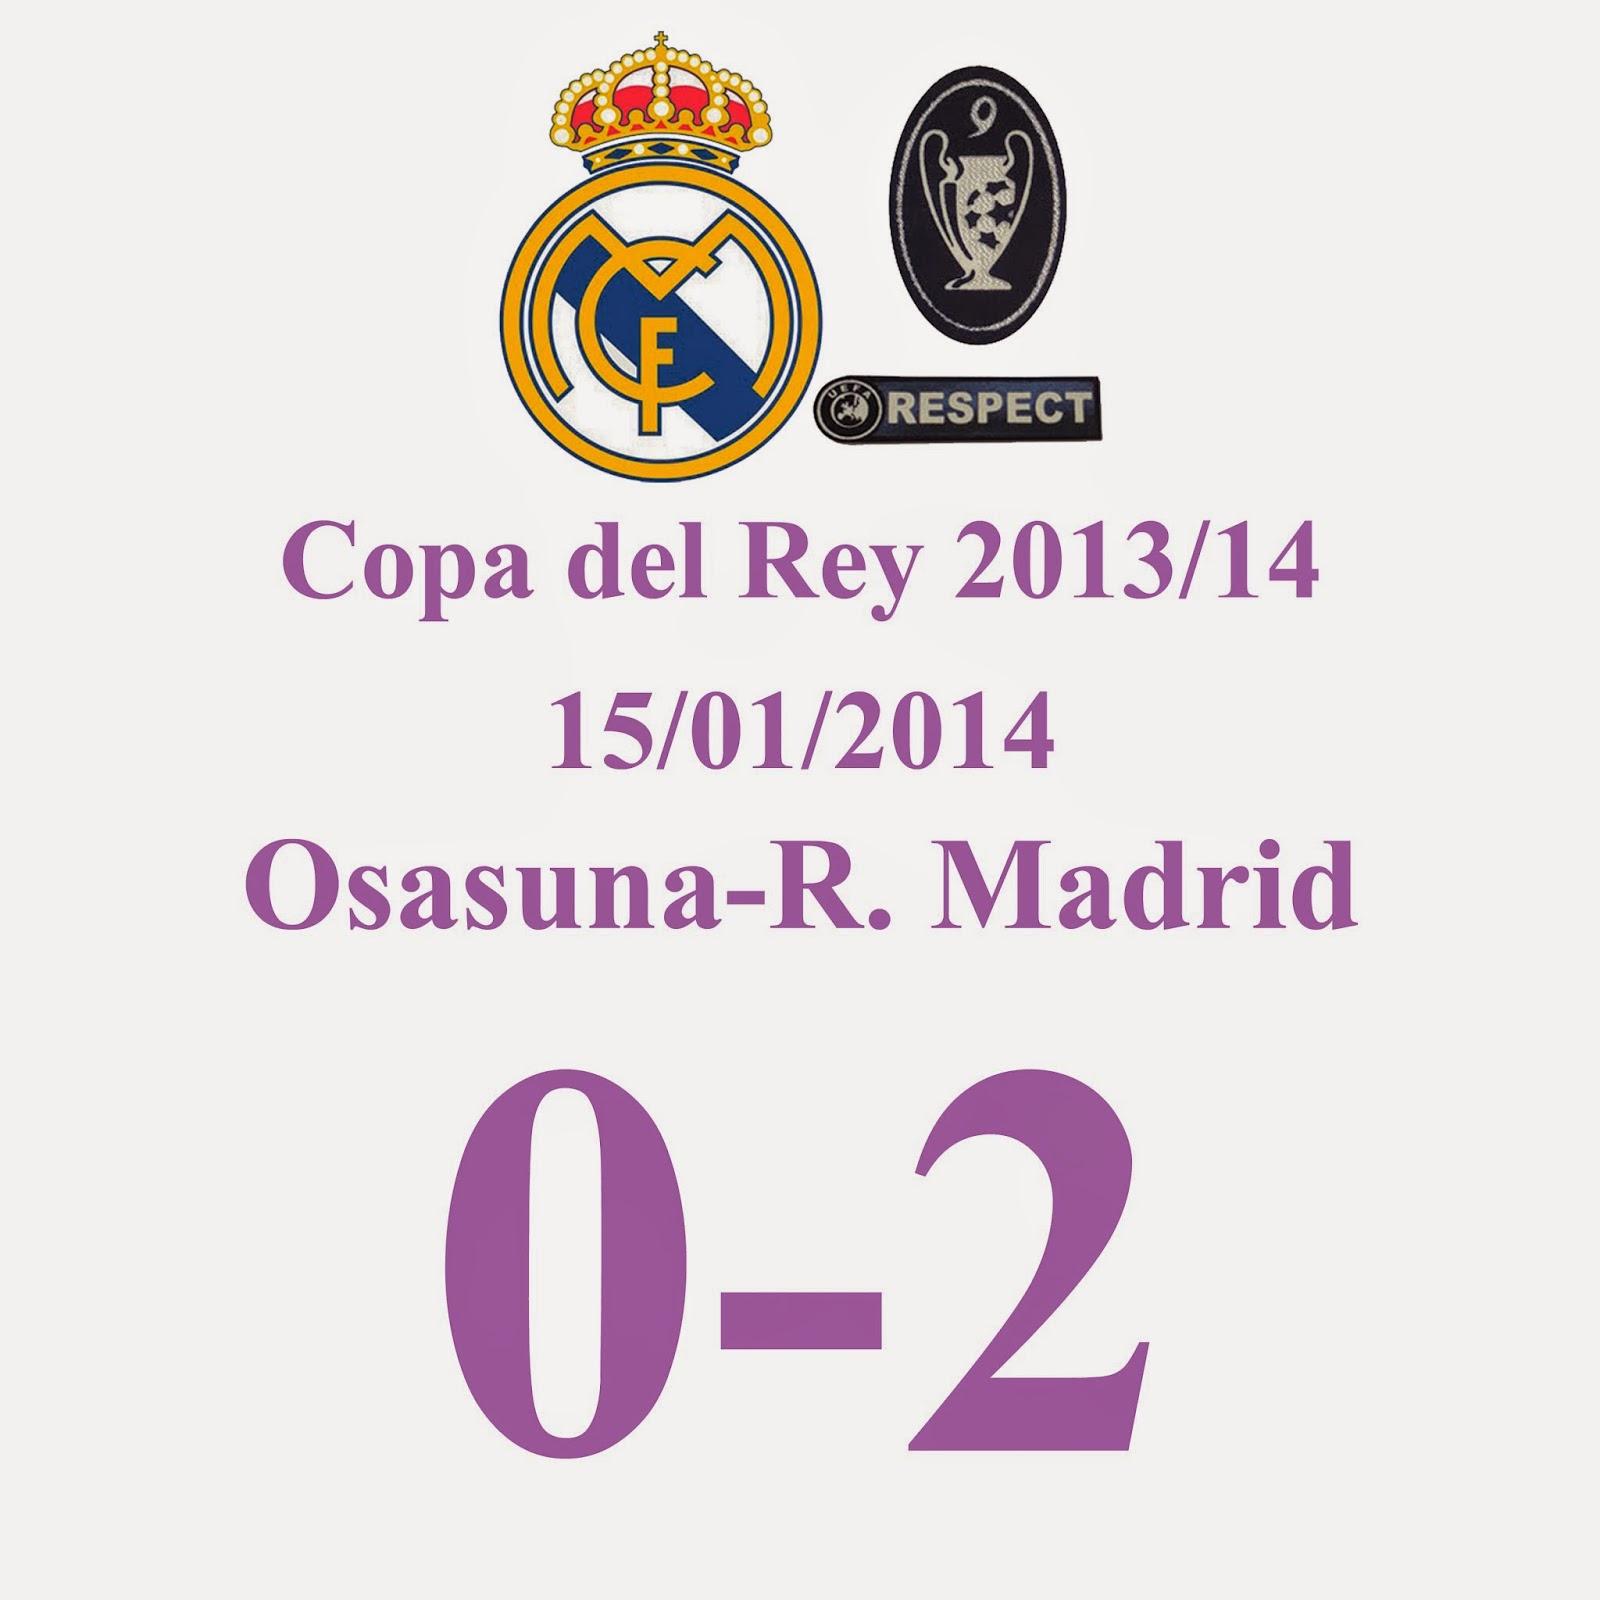 Osasuna 0 - 2 Real Madrid - 15/01/2014 - Copa del Rey 2013/14 - Golazo de Cristiano Ronaldo